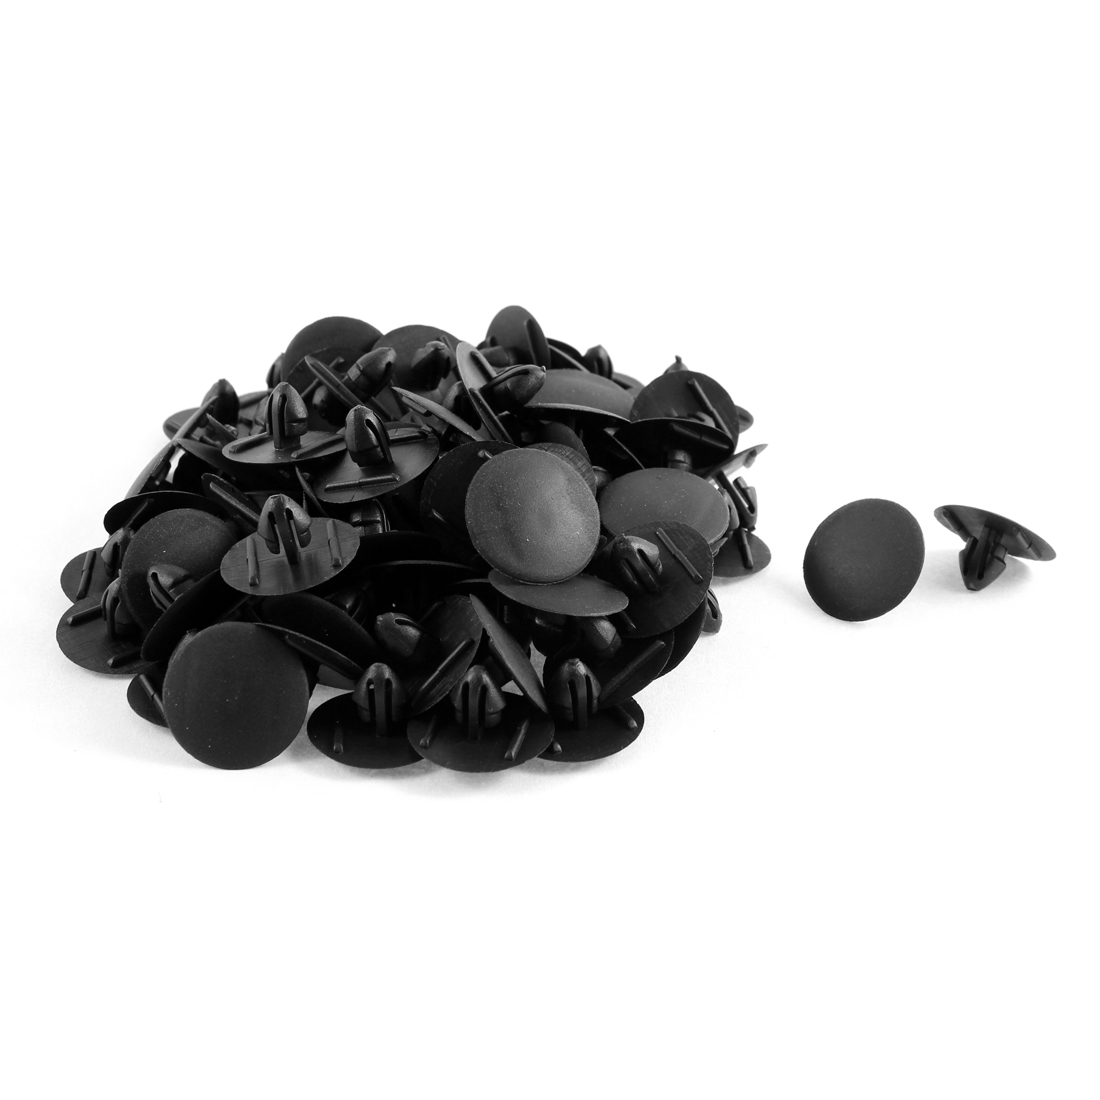 100 Pcs Black Plastic Splash Guard Moulding Bumper Clips 9mm x 11mm x 24mm